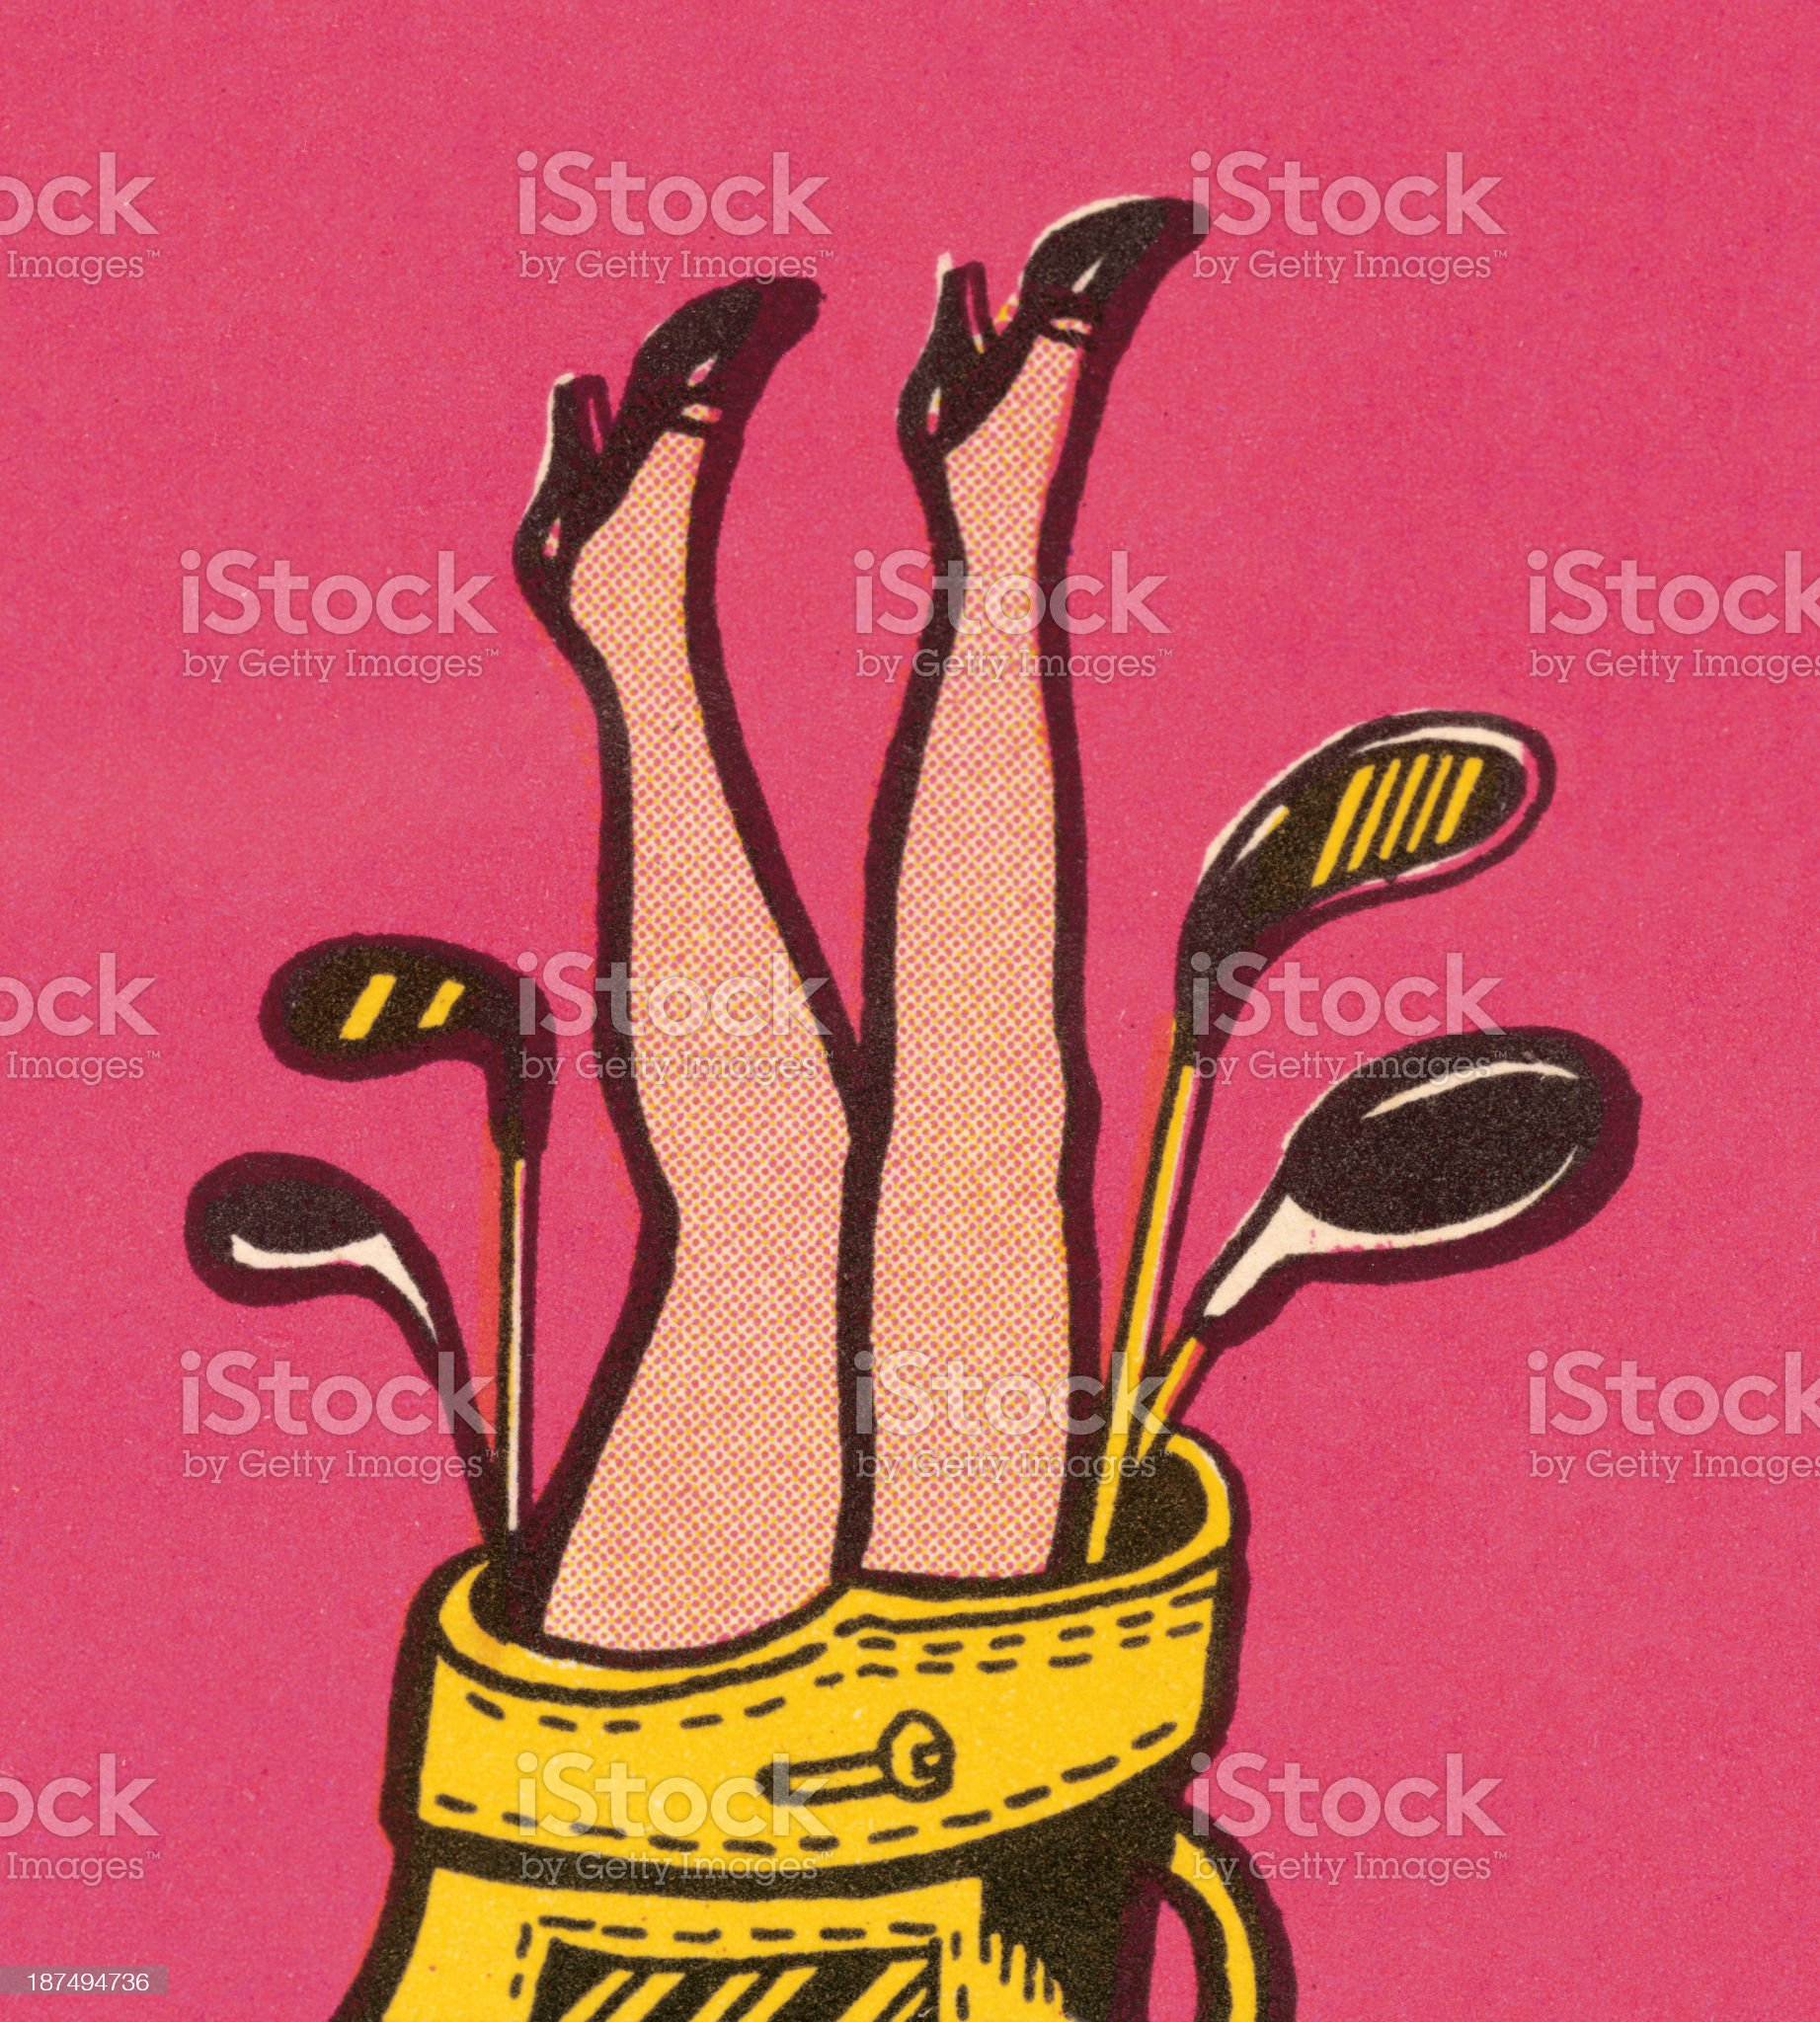 Woman's Legs in Golf Bag royalty-free stock vector art